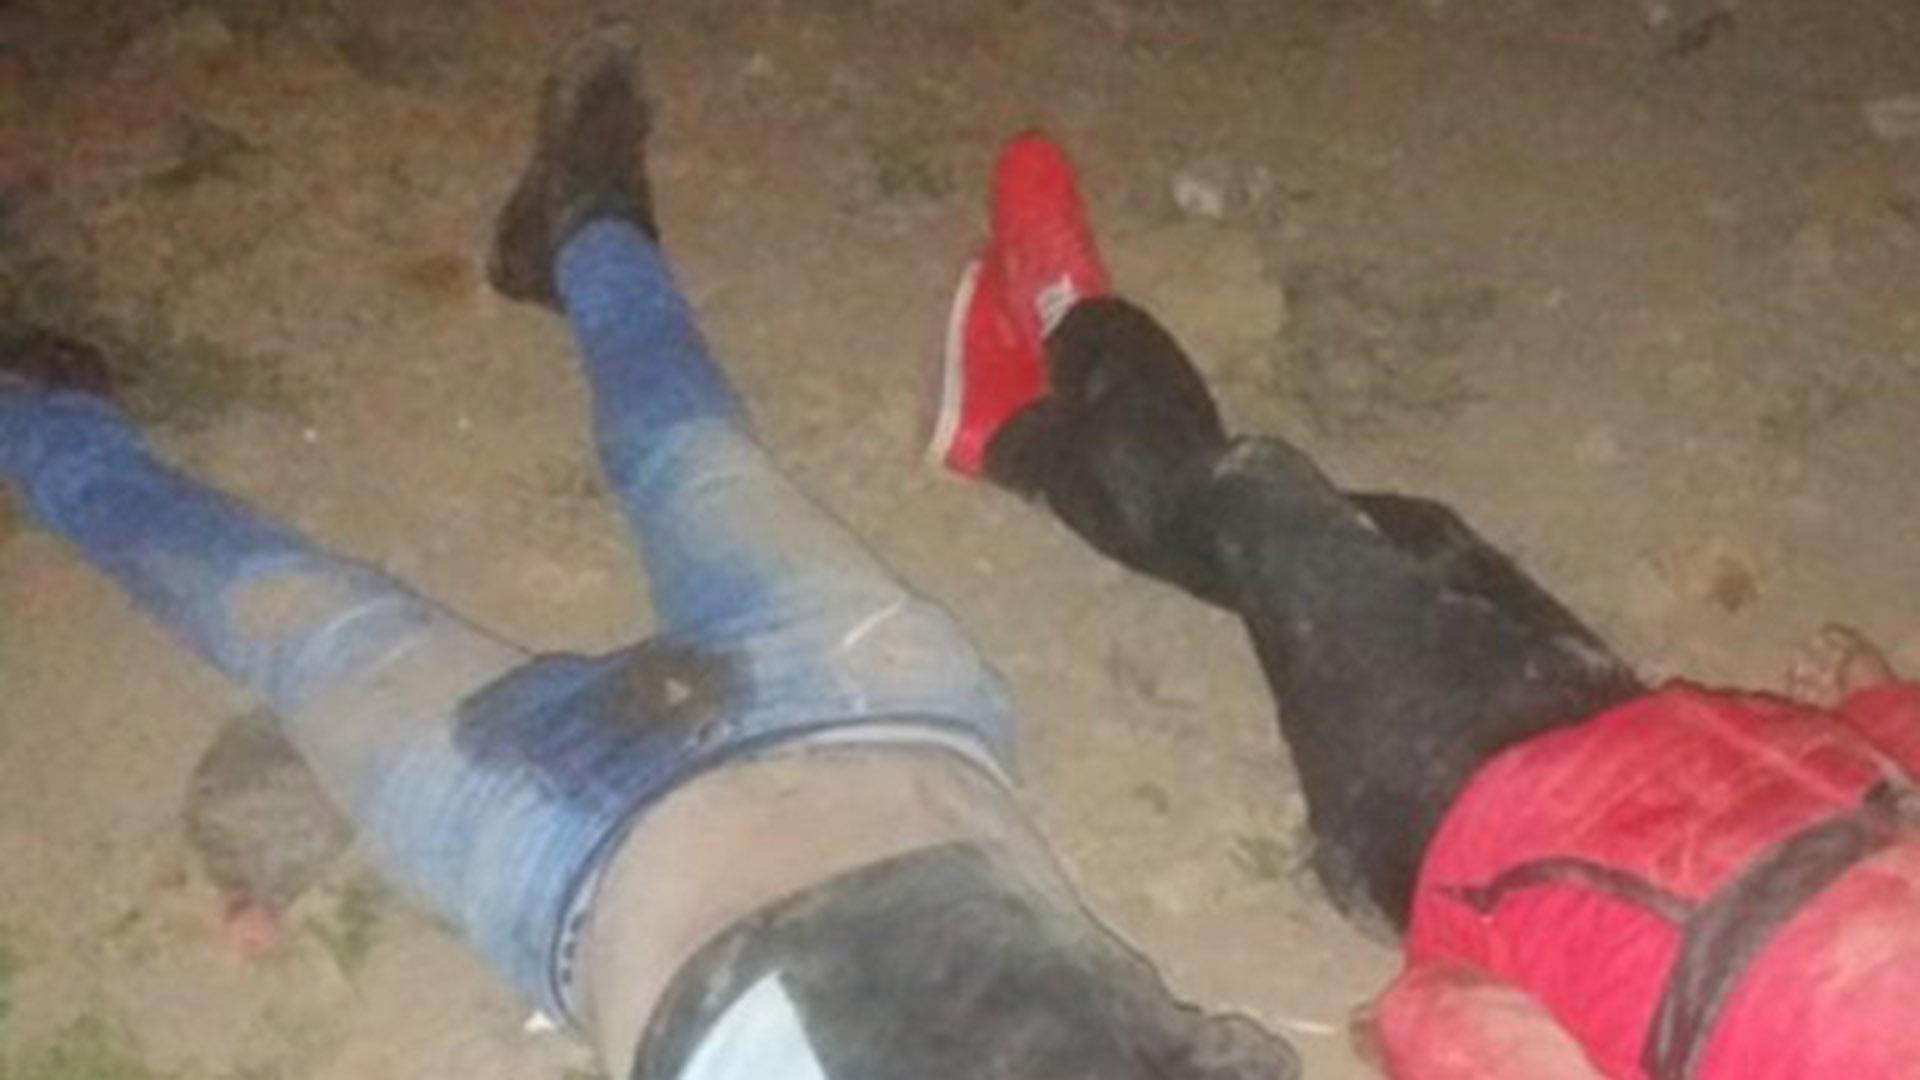 En Tlalpan dos jóvenes fueron asesinados a balazos. (Foto: @ciemergencias)